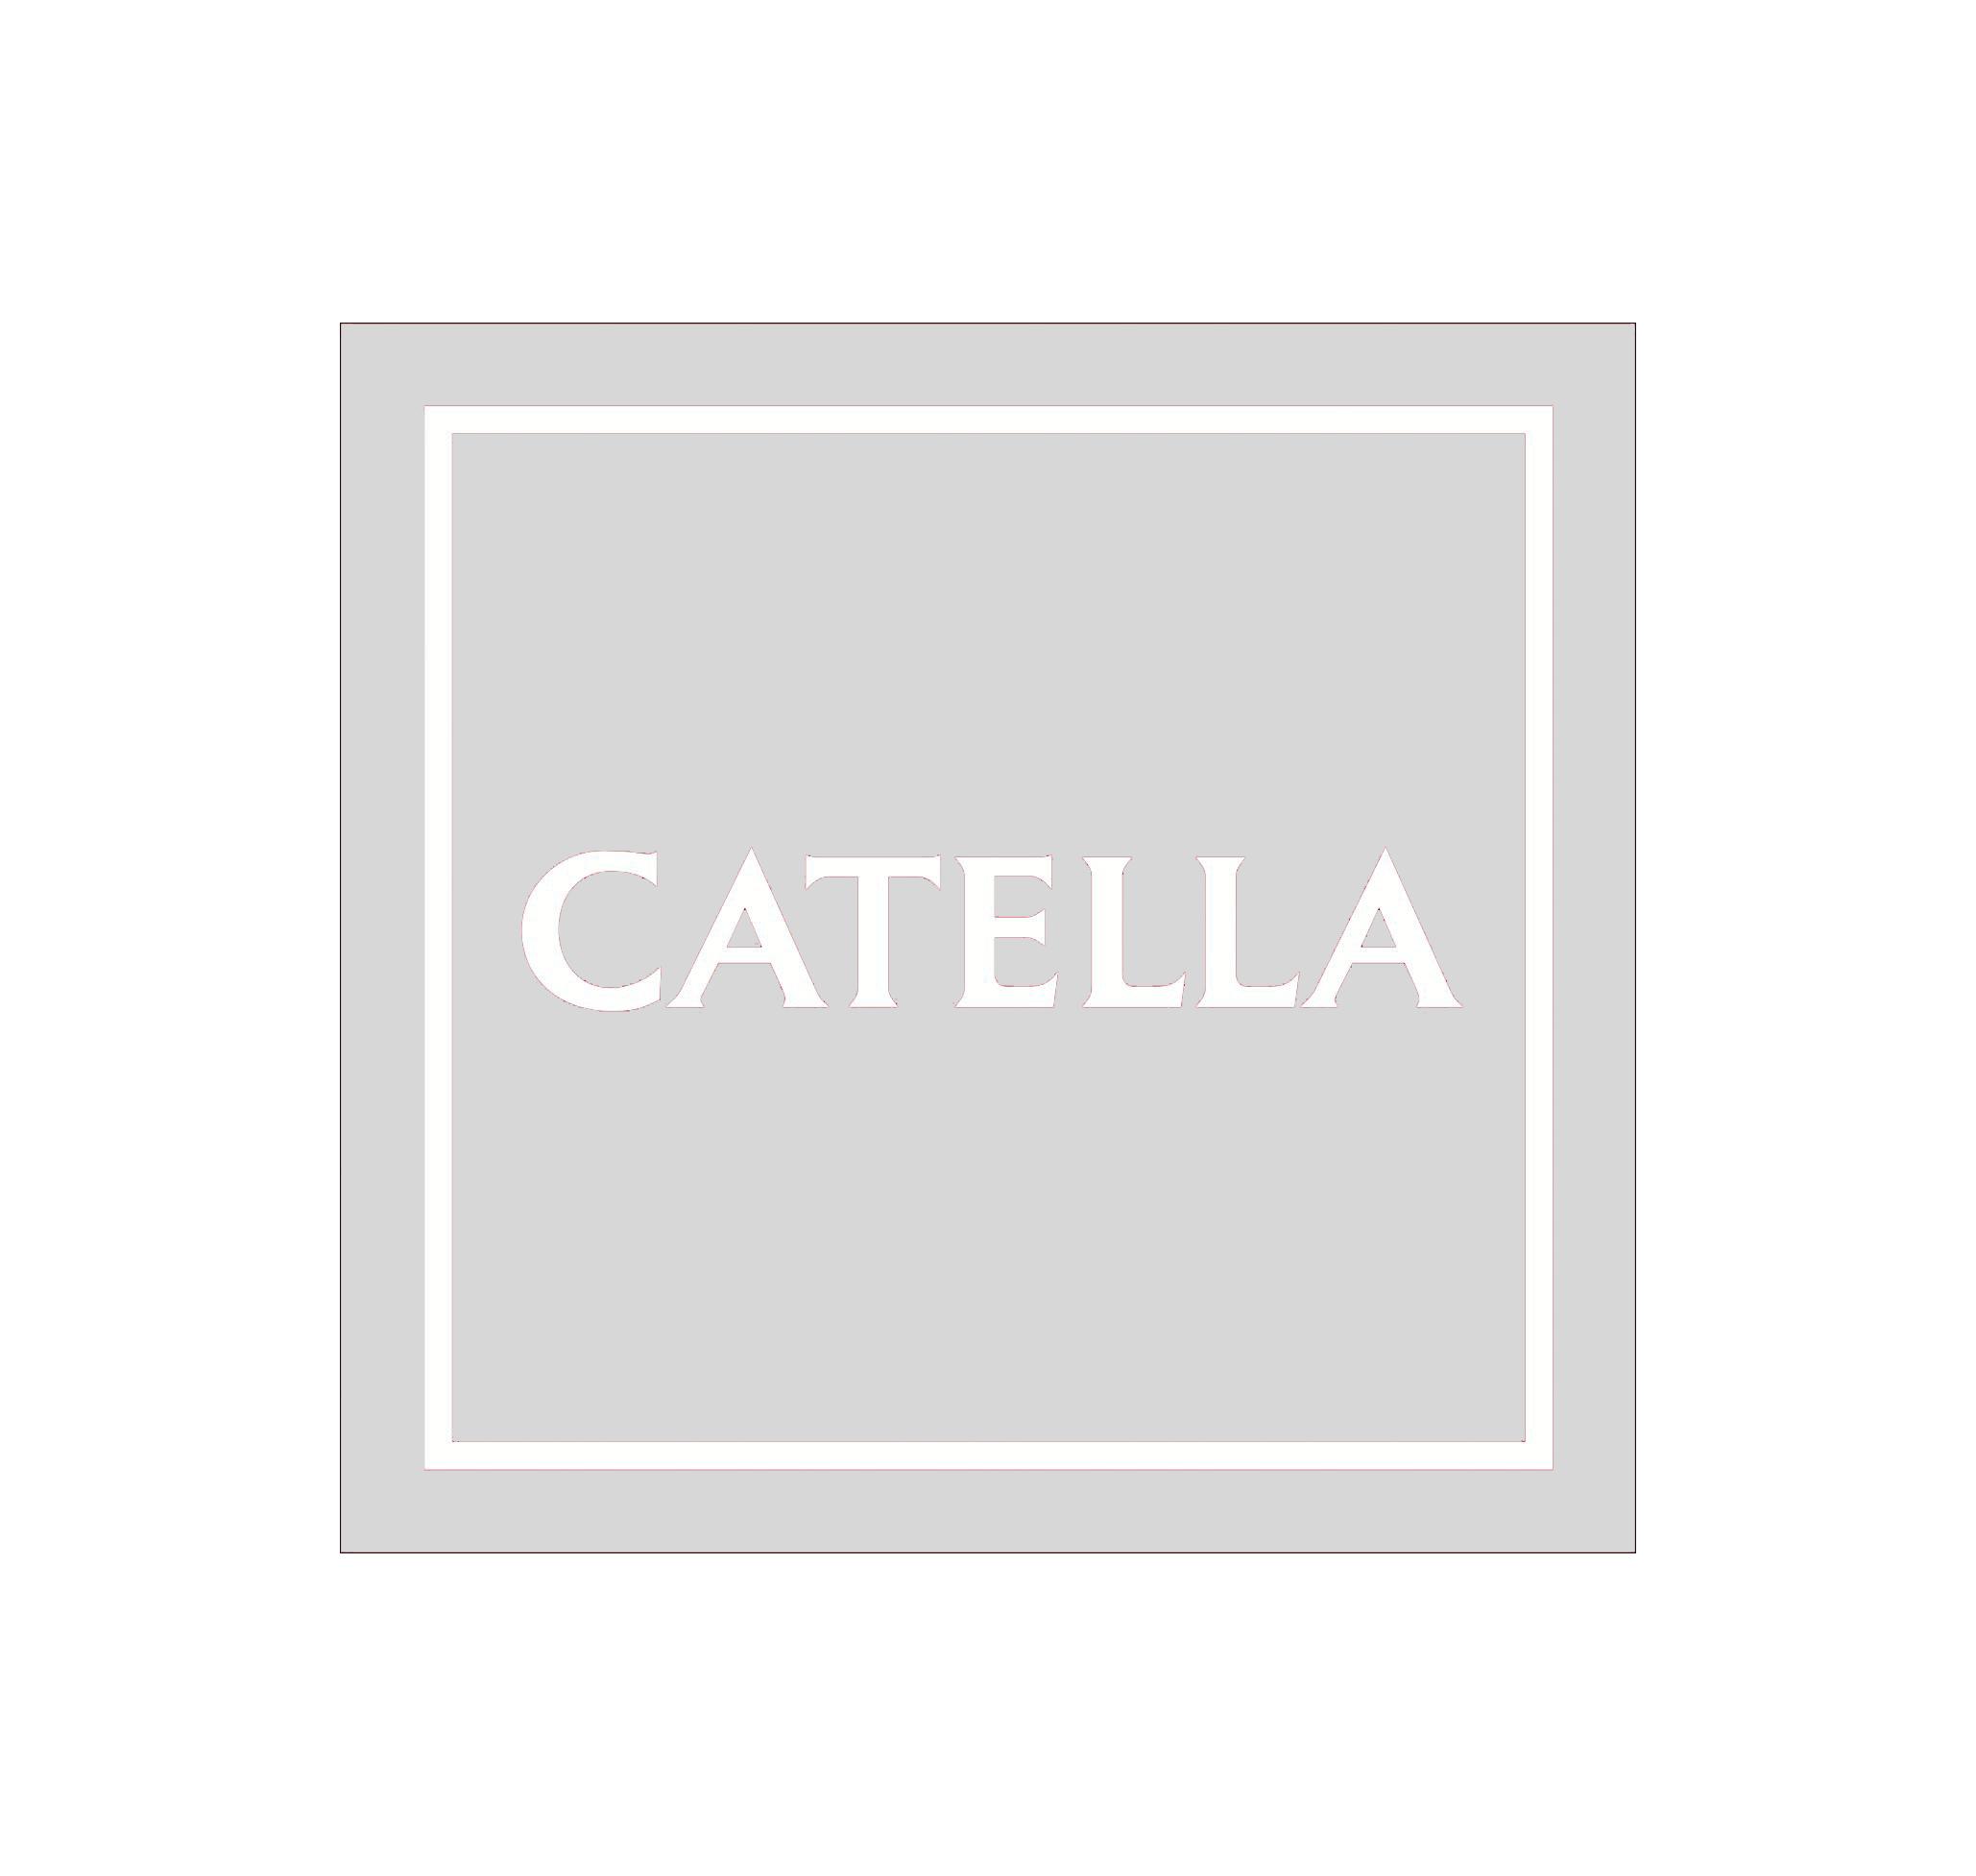 Catella Logo